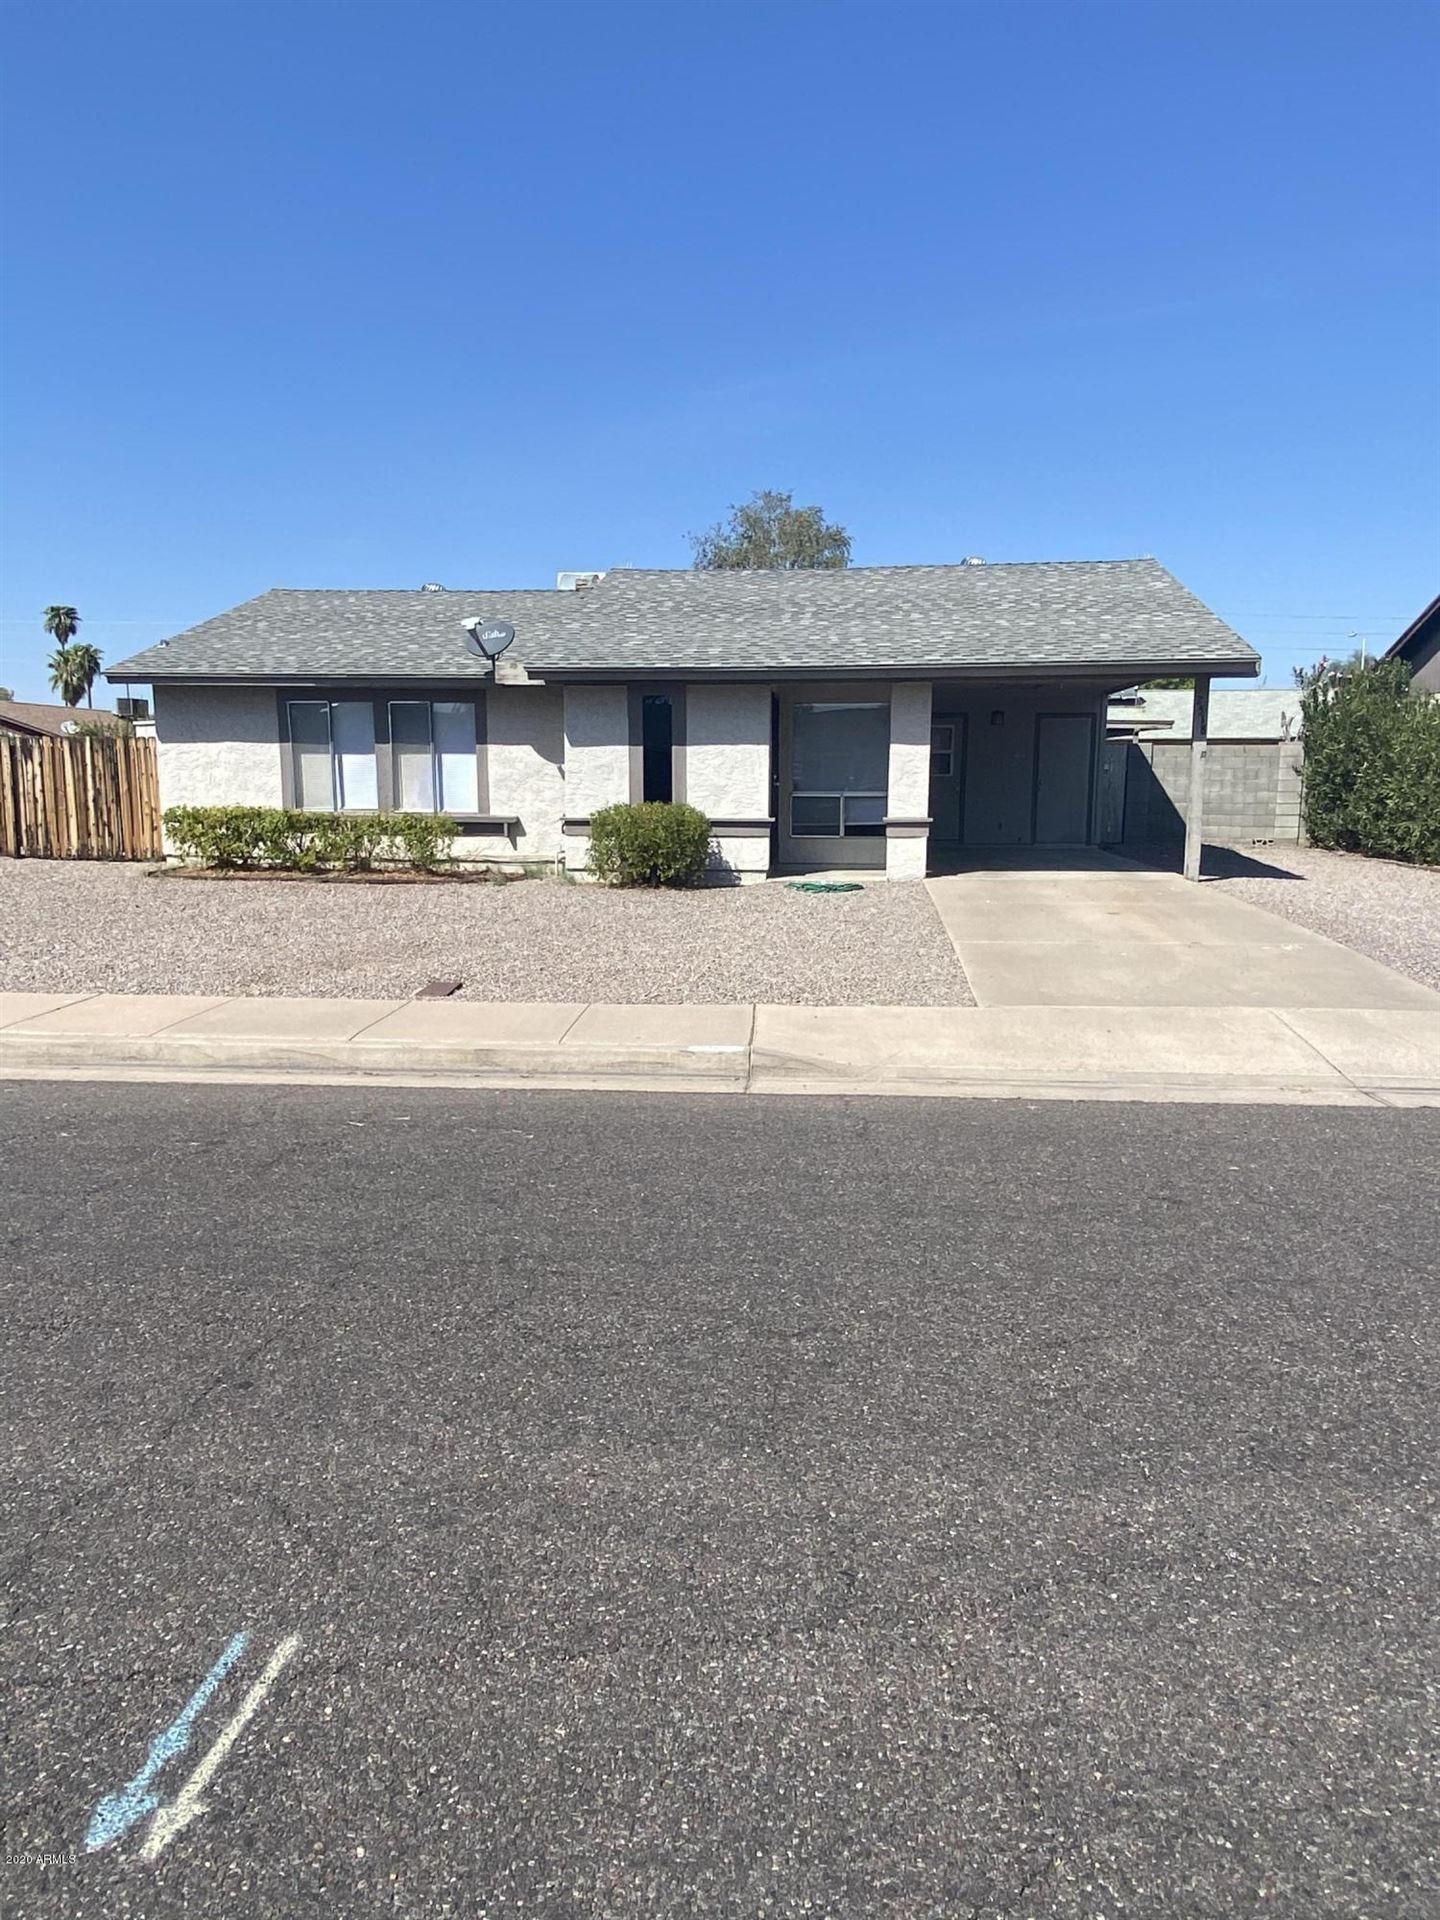 2518 E BUTTE Street, Mesa, AZ 85213 - MLS#: 6138881